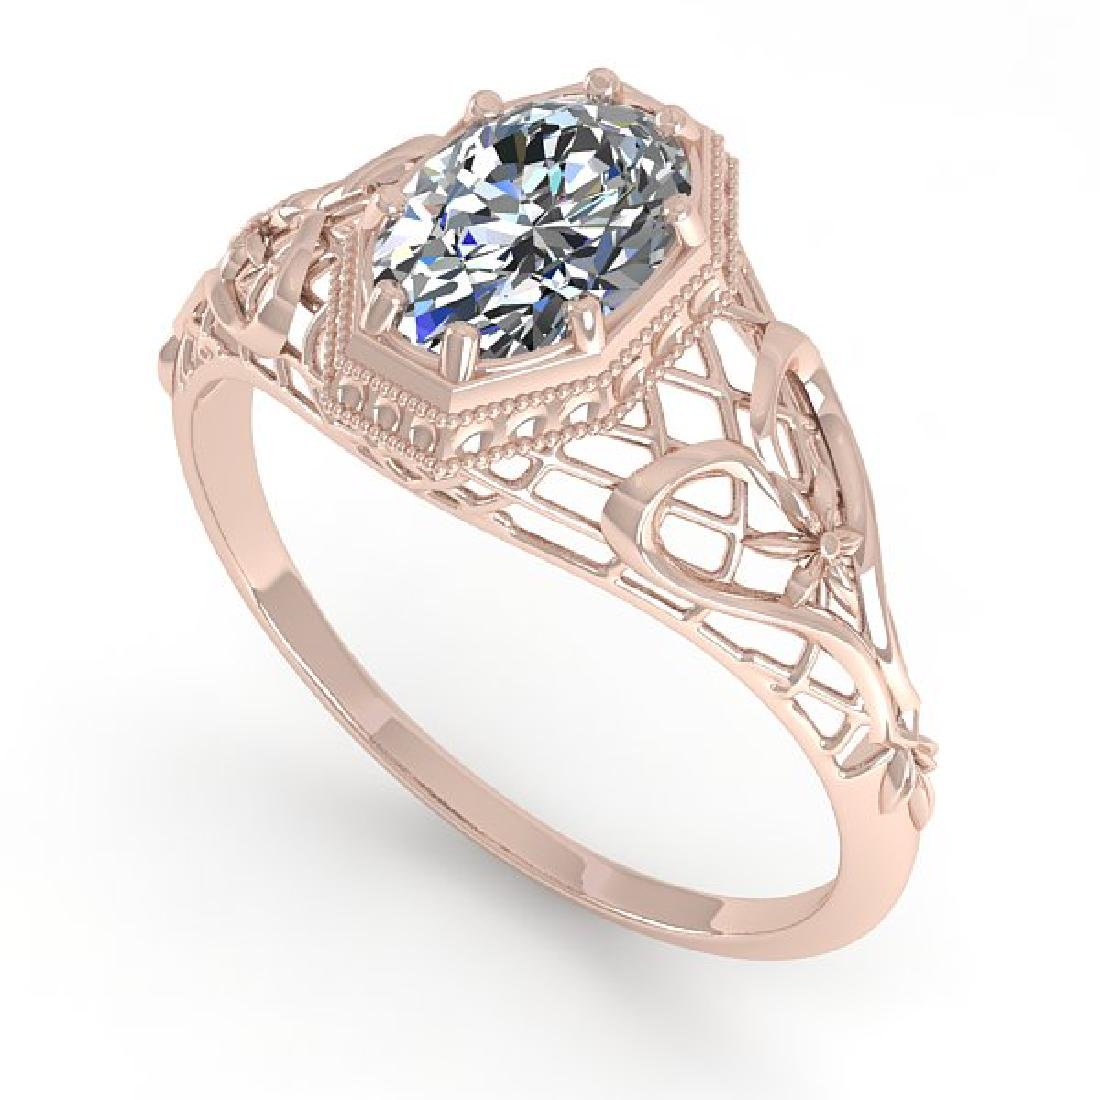 1.0 CTW VS/SI Oval Diamond Solitaire Ring Art Deco 14K - 2